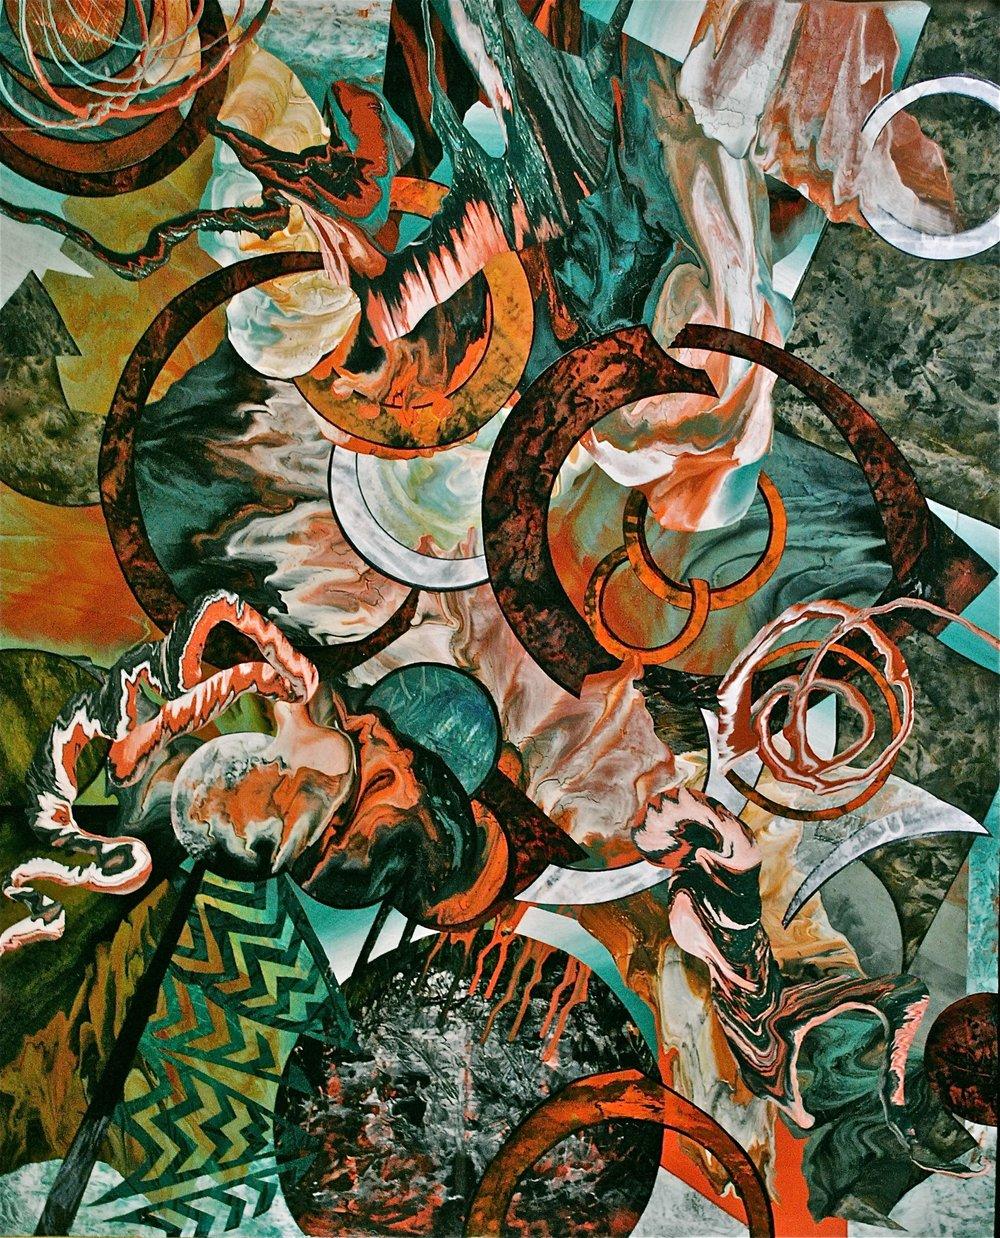 Irina Lloyd-Jones, Burning Bright, Acrylic on very thick high quality handmade paper, H 55.9 x 45.3 W x 0.1 D